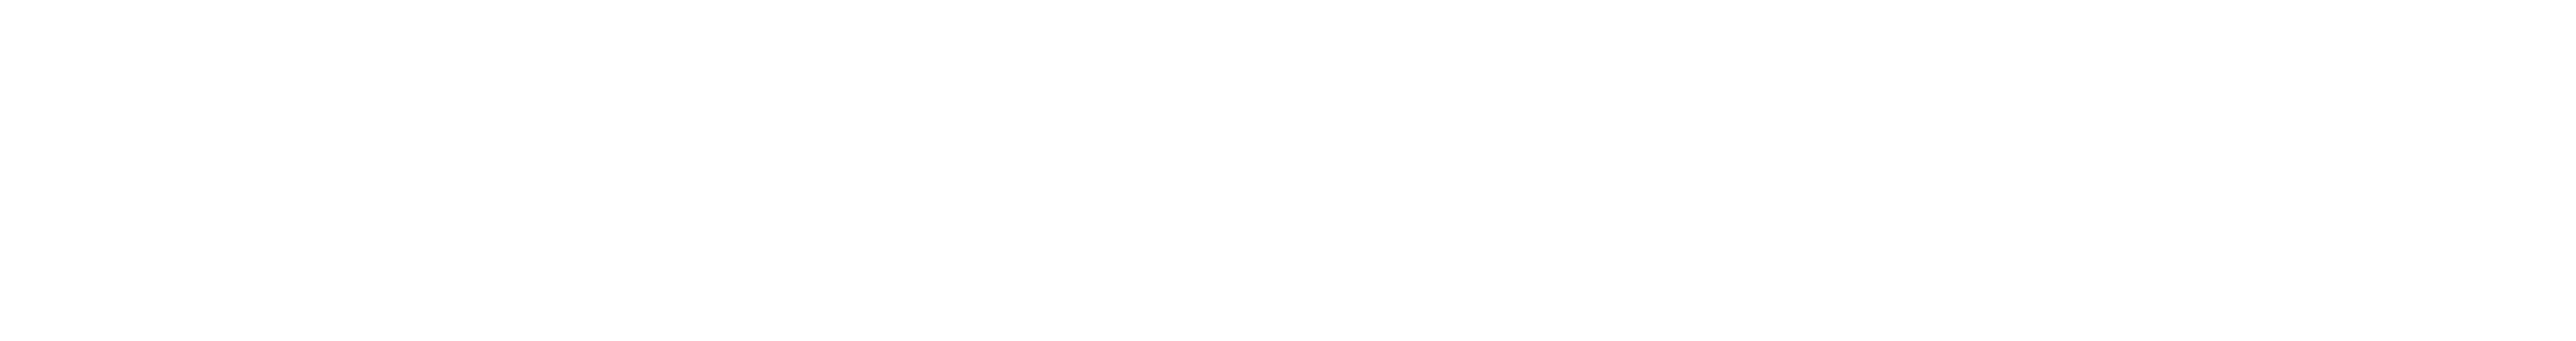 Sharecare logo.